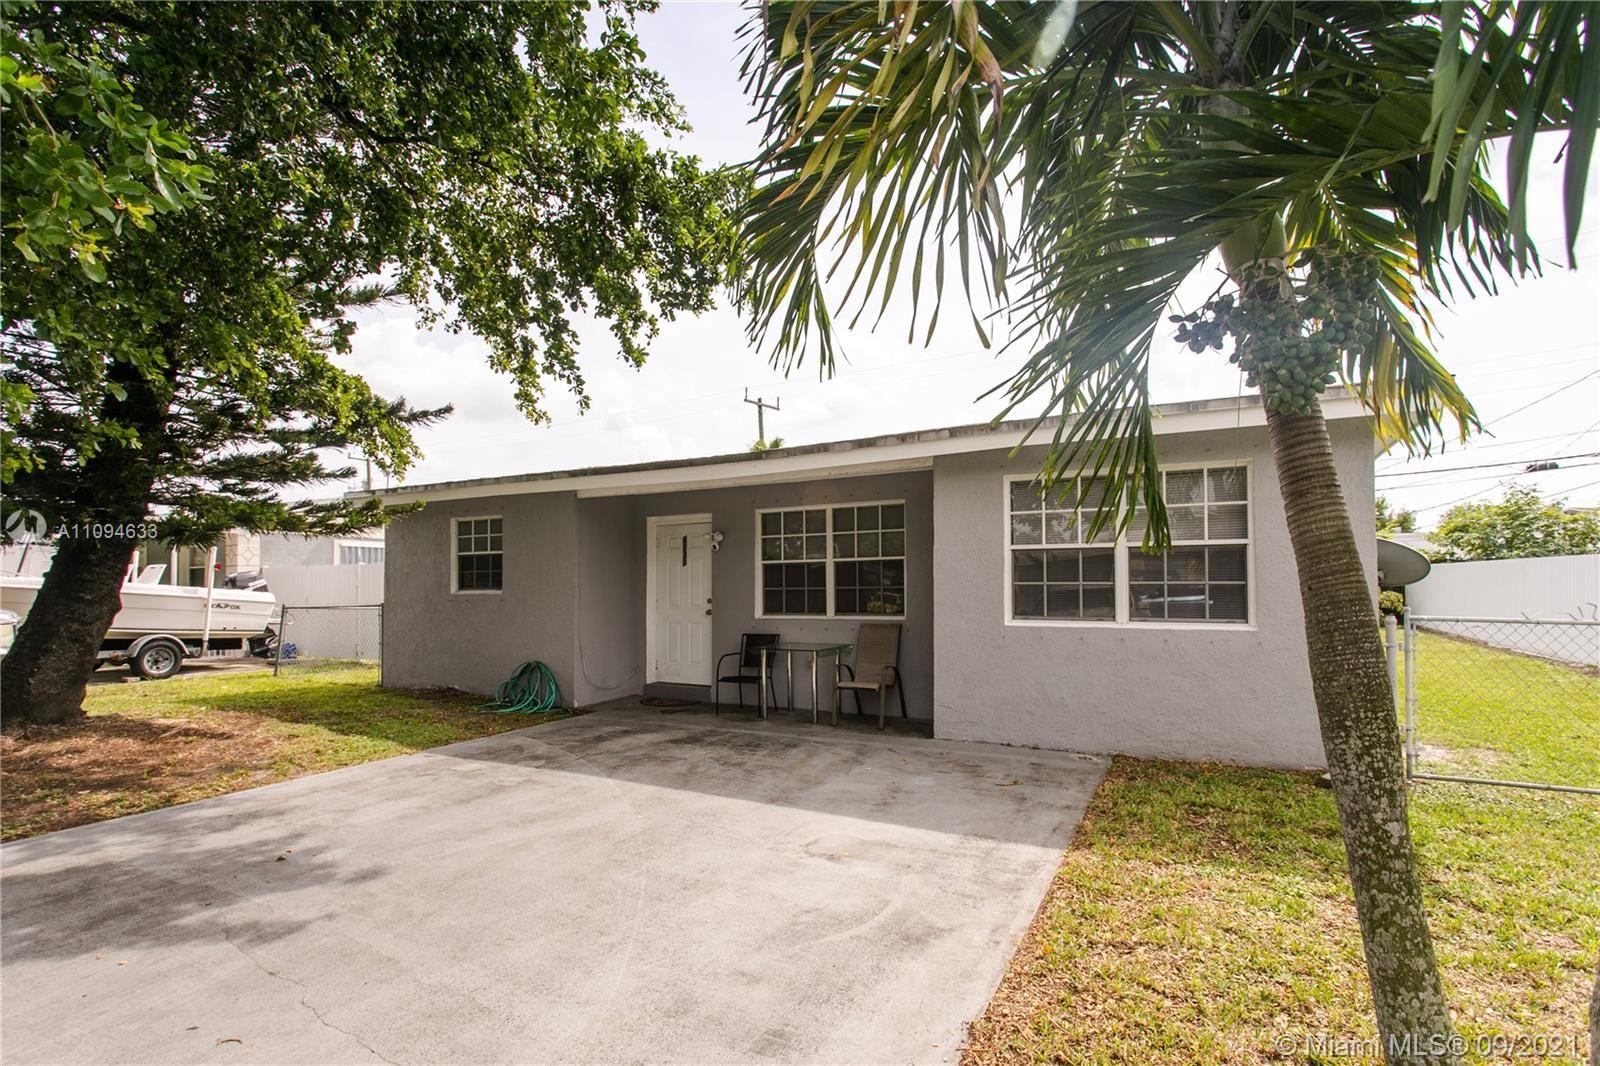 6230 Fletcher St, Hollywood, FL 33023 - #: A11094633